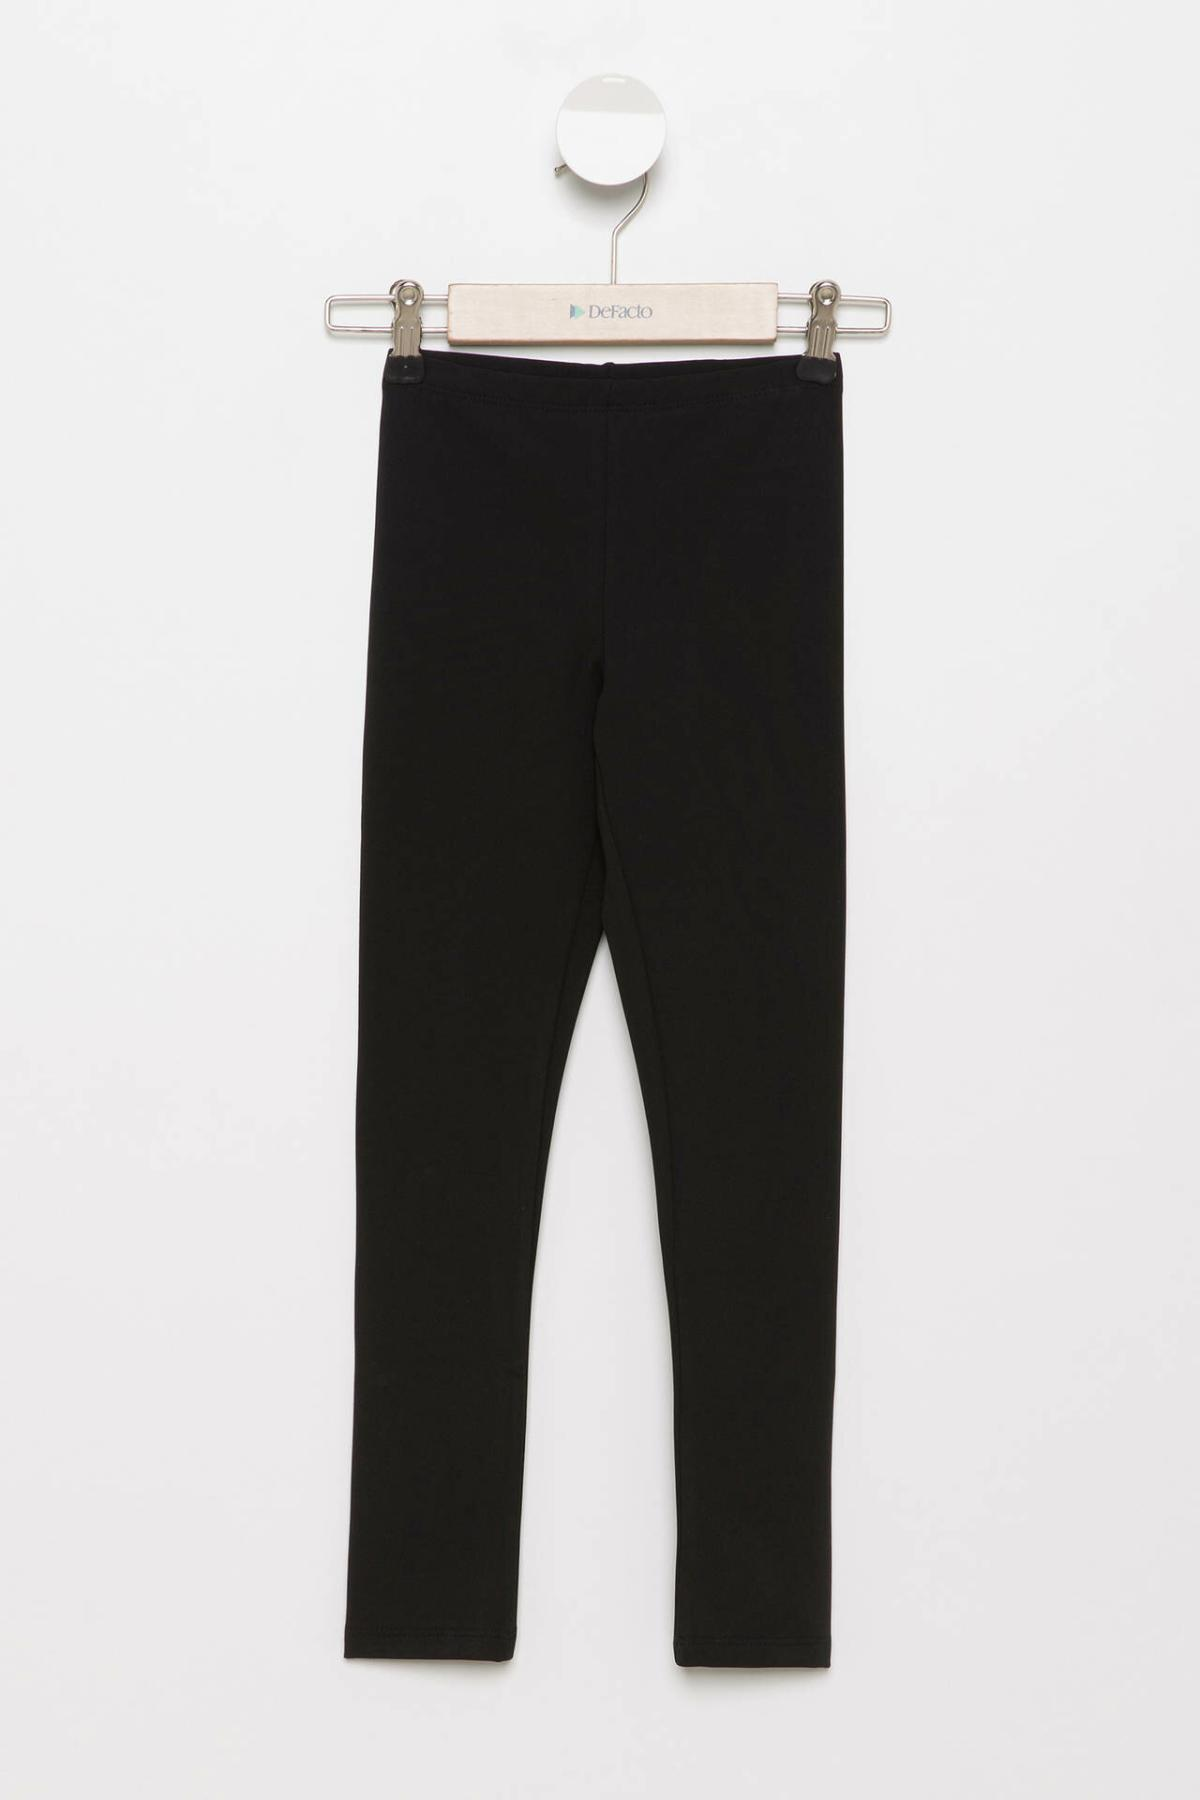 DeFacto Girl Autumn Black White Leggings Pants Girls Slim Fit Long Pants Girls Elastic Leggings-H6532A417AU